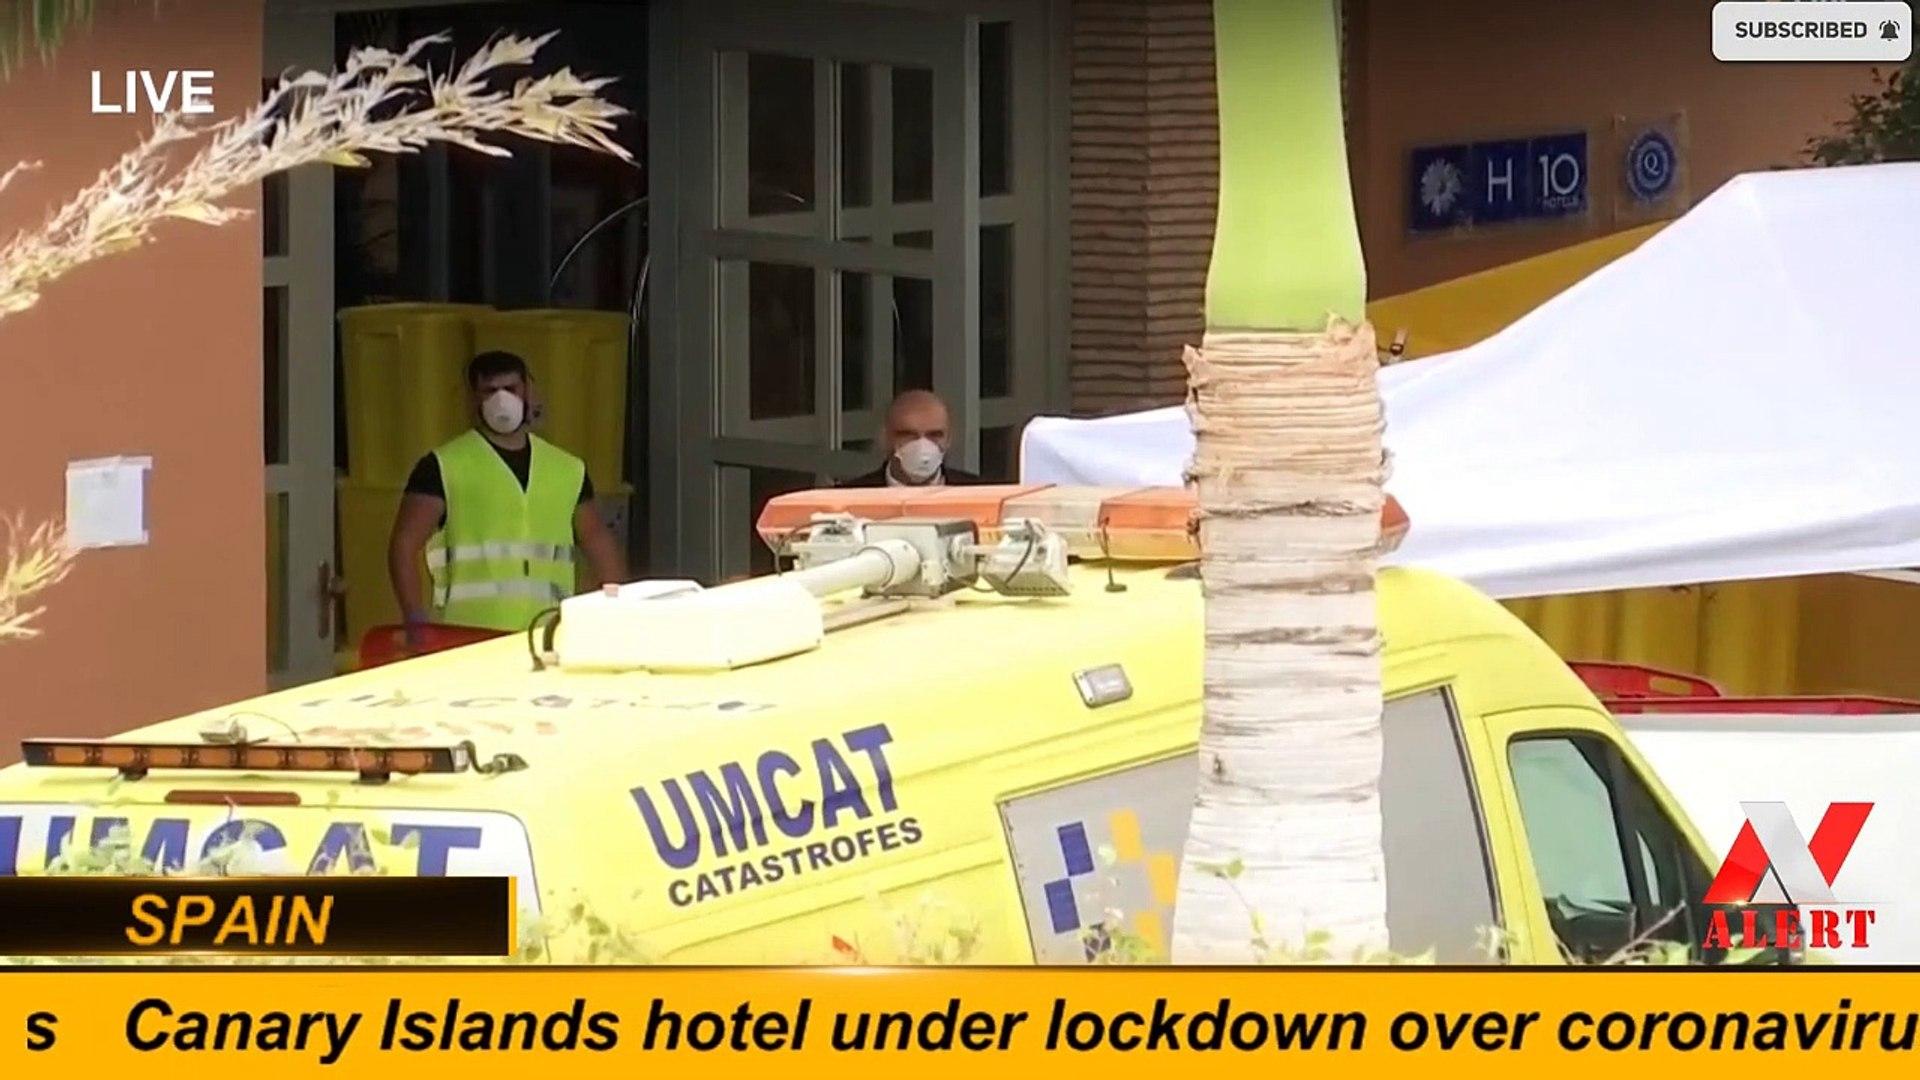 Canary Islands hotel under lockdown over coronavirus -- SPAIN